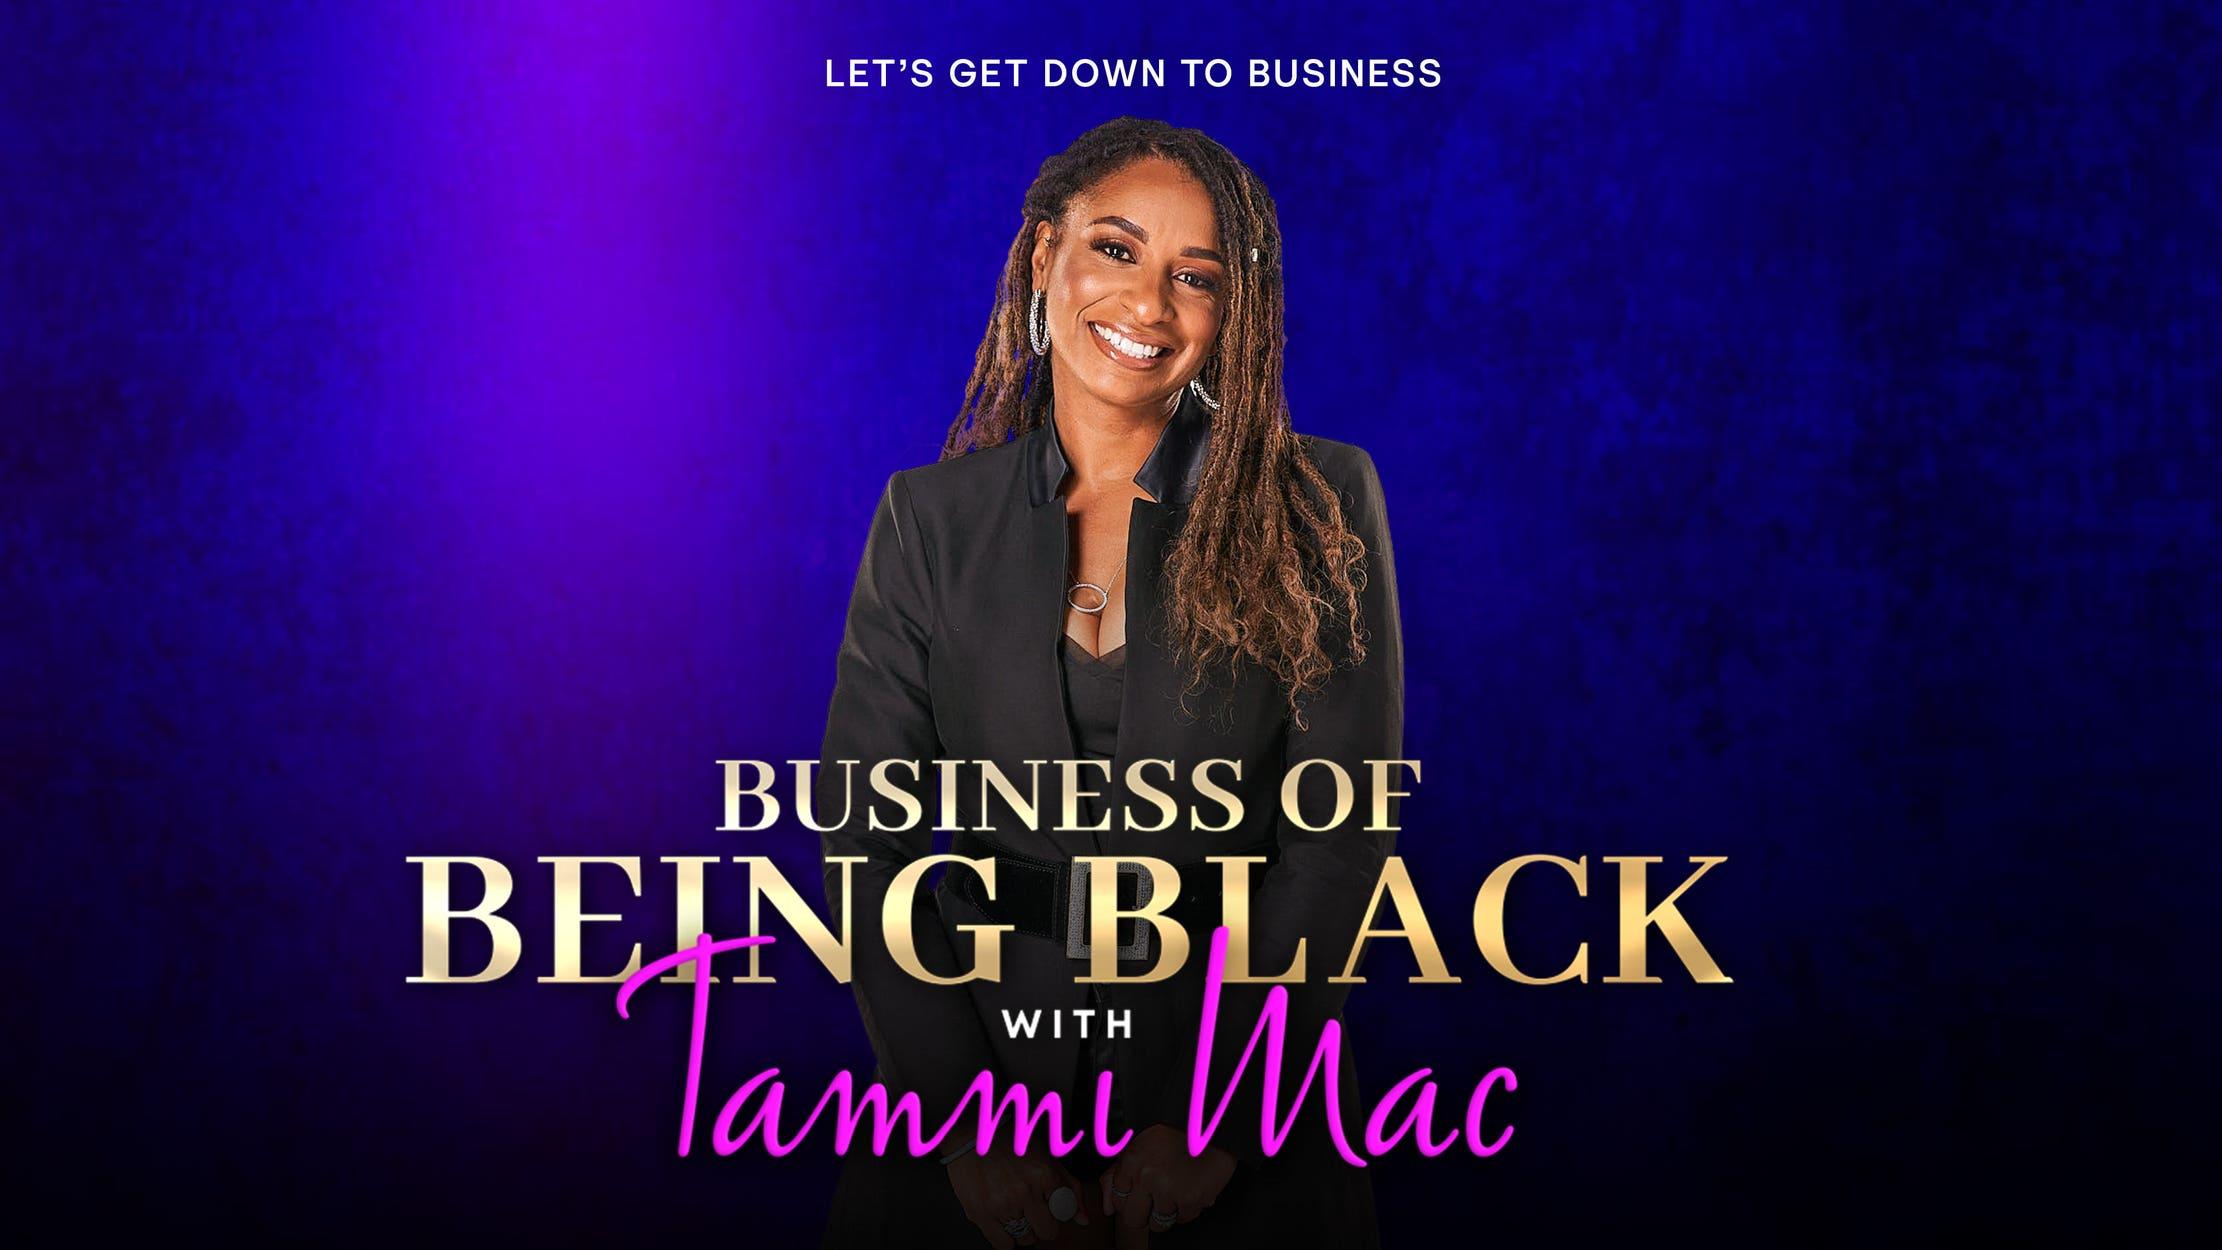 The Tammi Mac Late Show seriesDetail